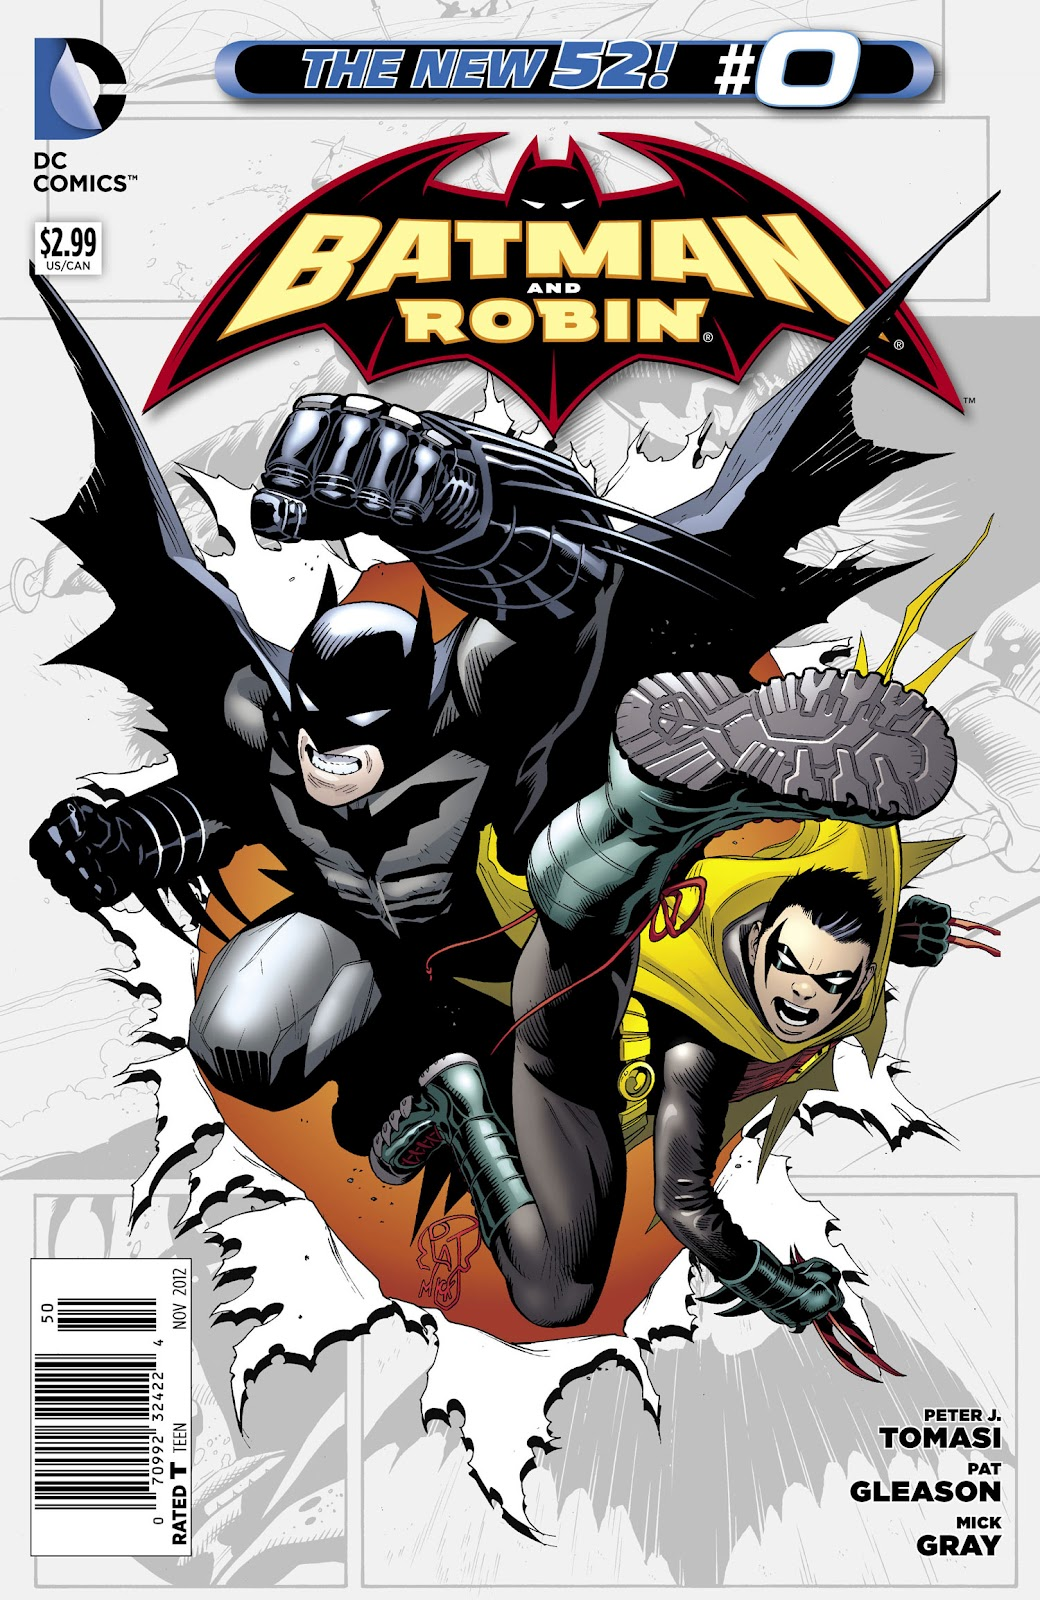 Fashion of the bat an extremely thorough examination of batman s - Batman And Robin 0 Story Peter J Tomasi